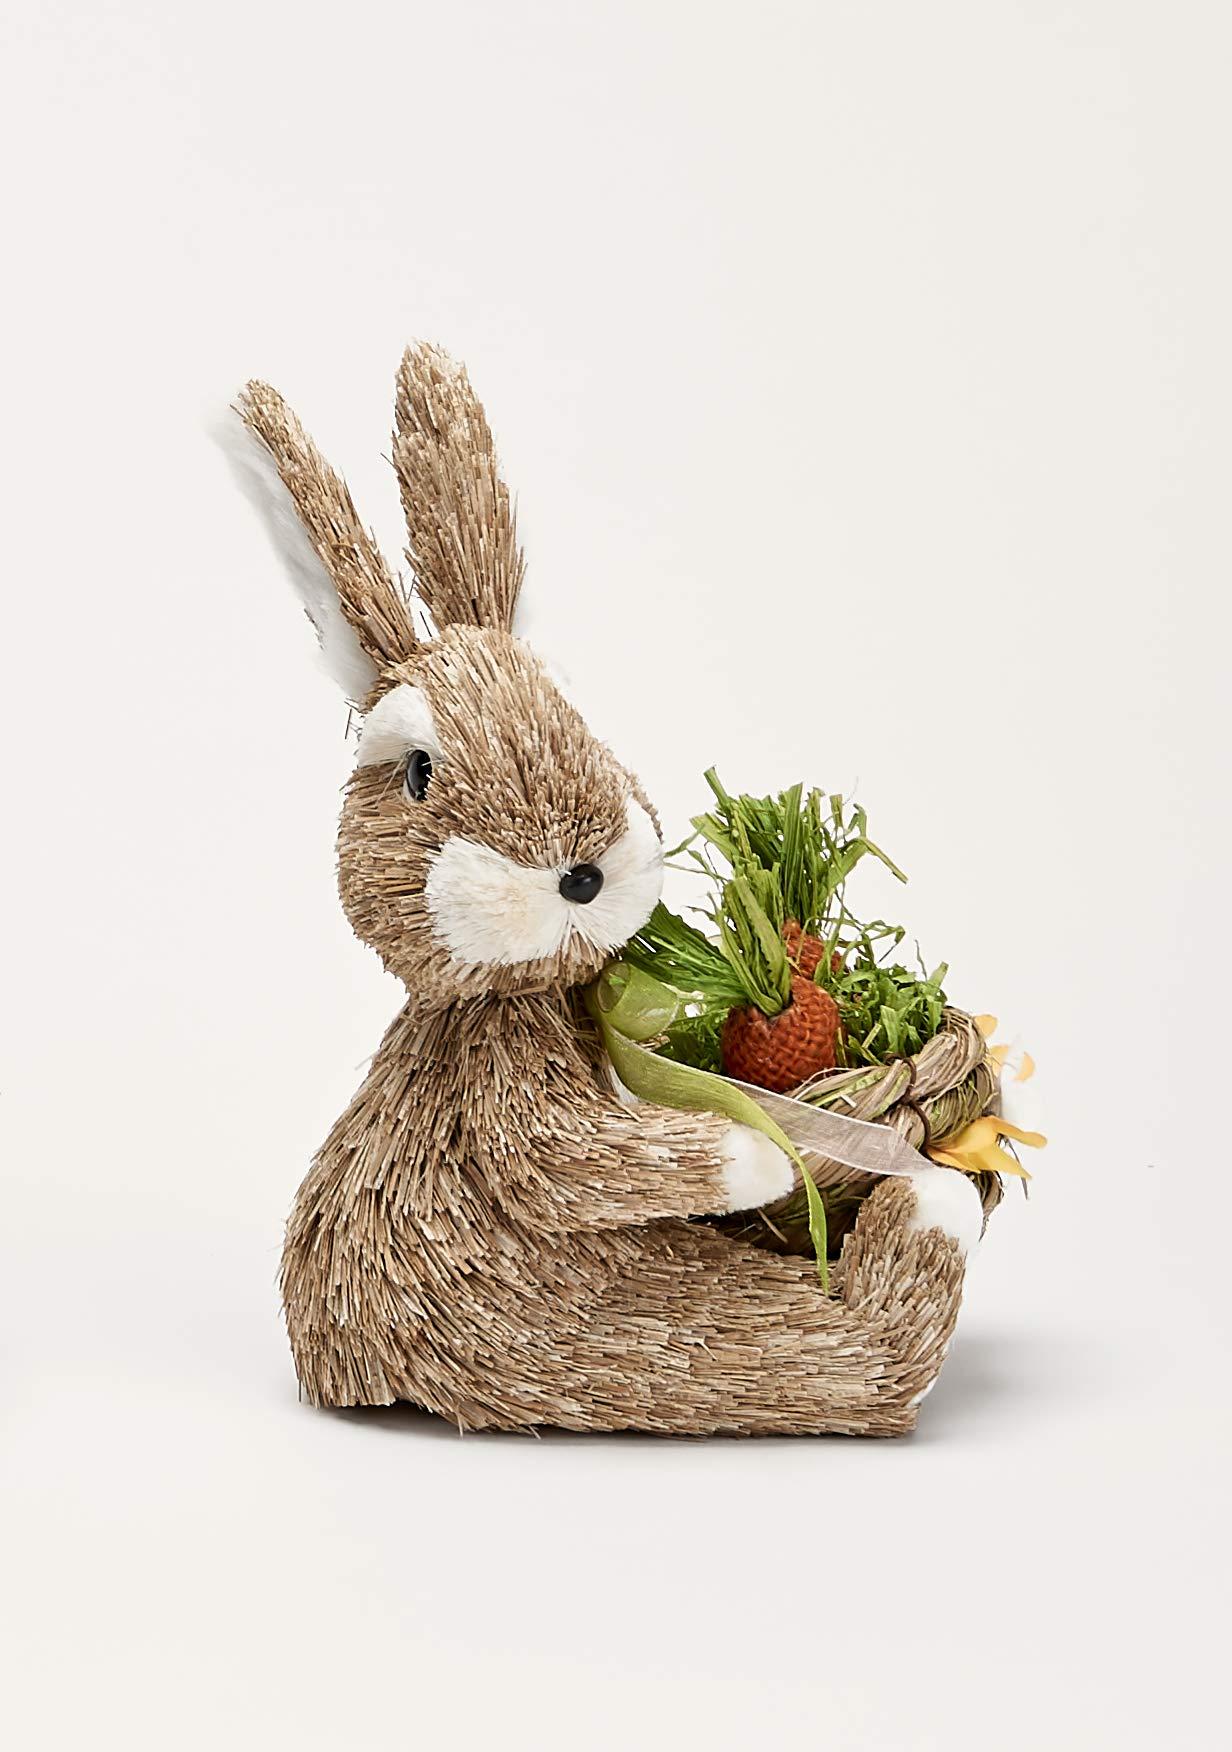 Worth Imports 9'' Sitting Bunny W/Basket Figurine, Orange,Yellow,White,Baige